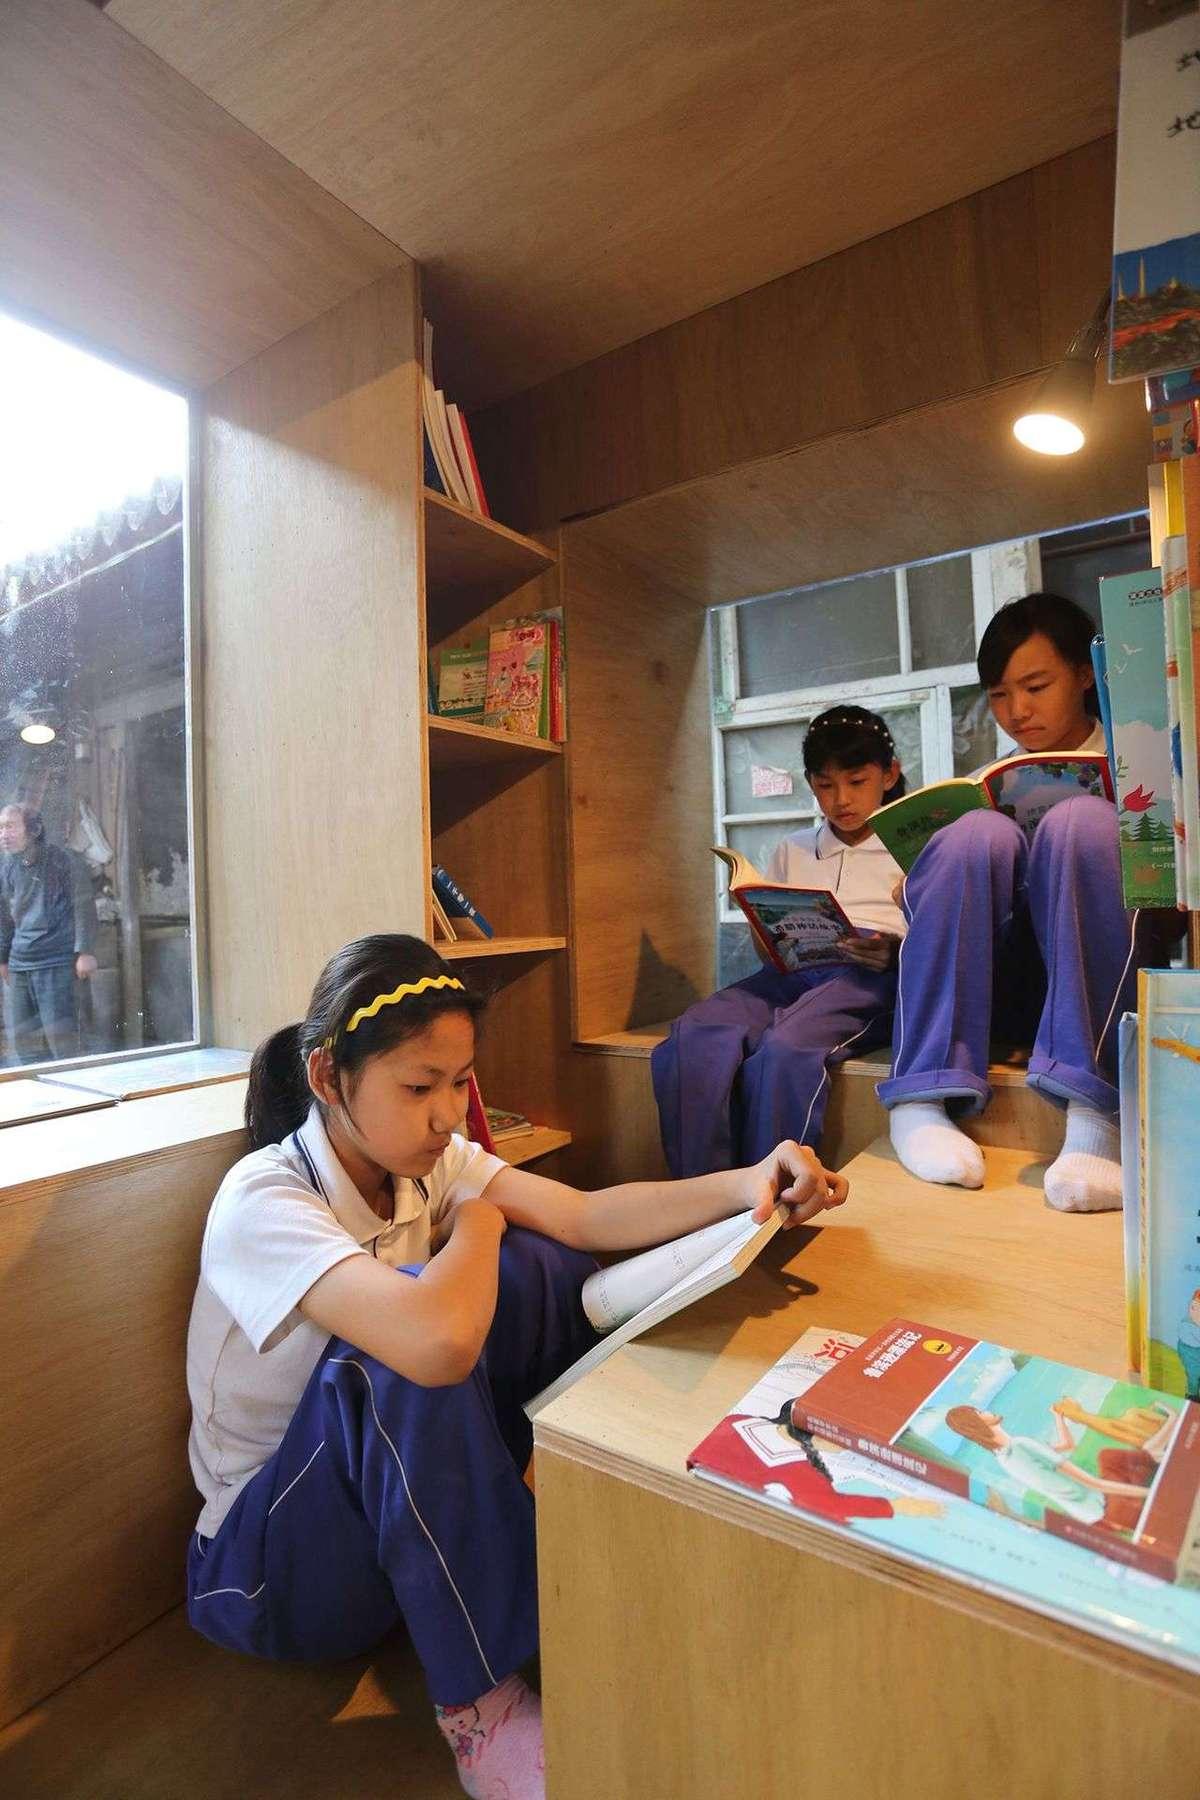 ZAO/standardarchitecture: Micro-Yuan'er in un hutong di Pechino